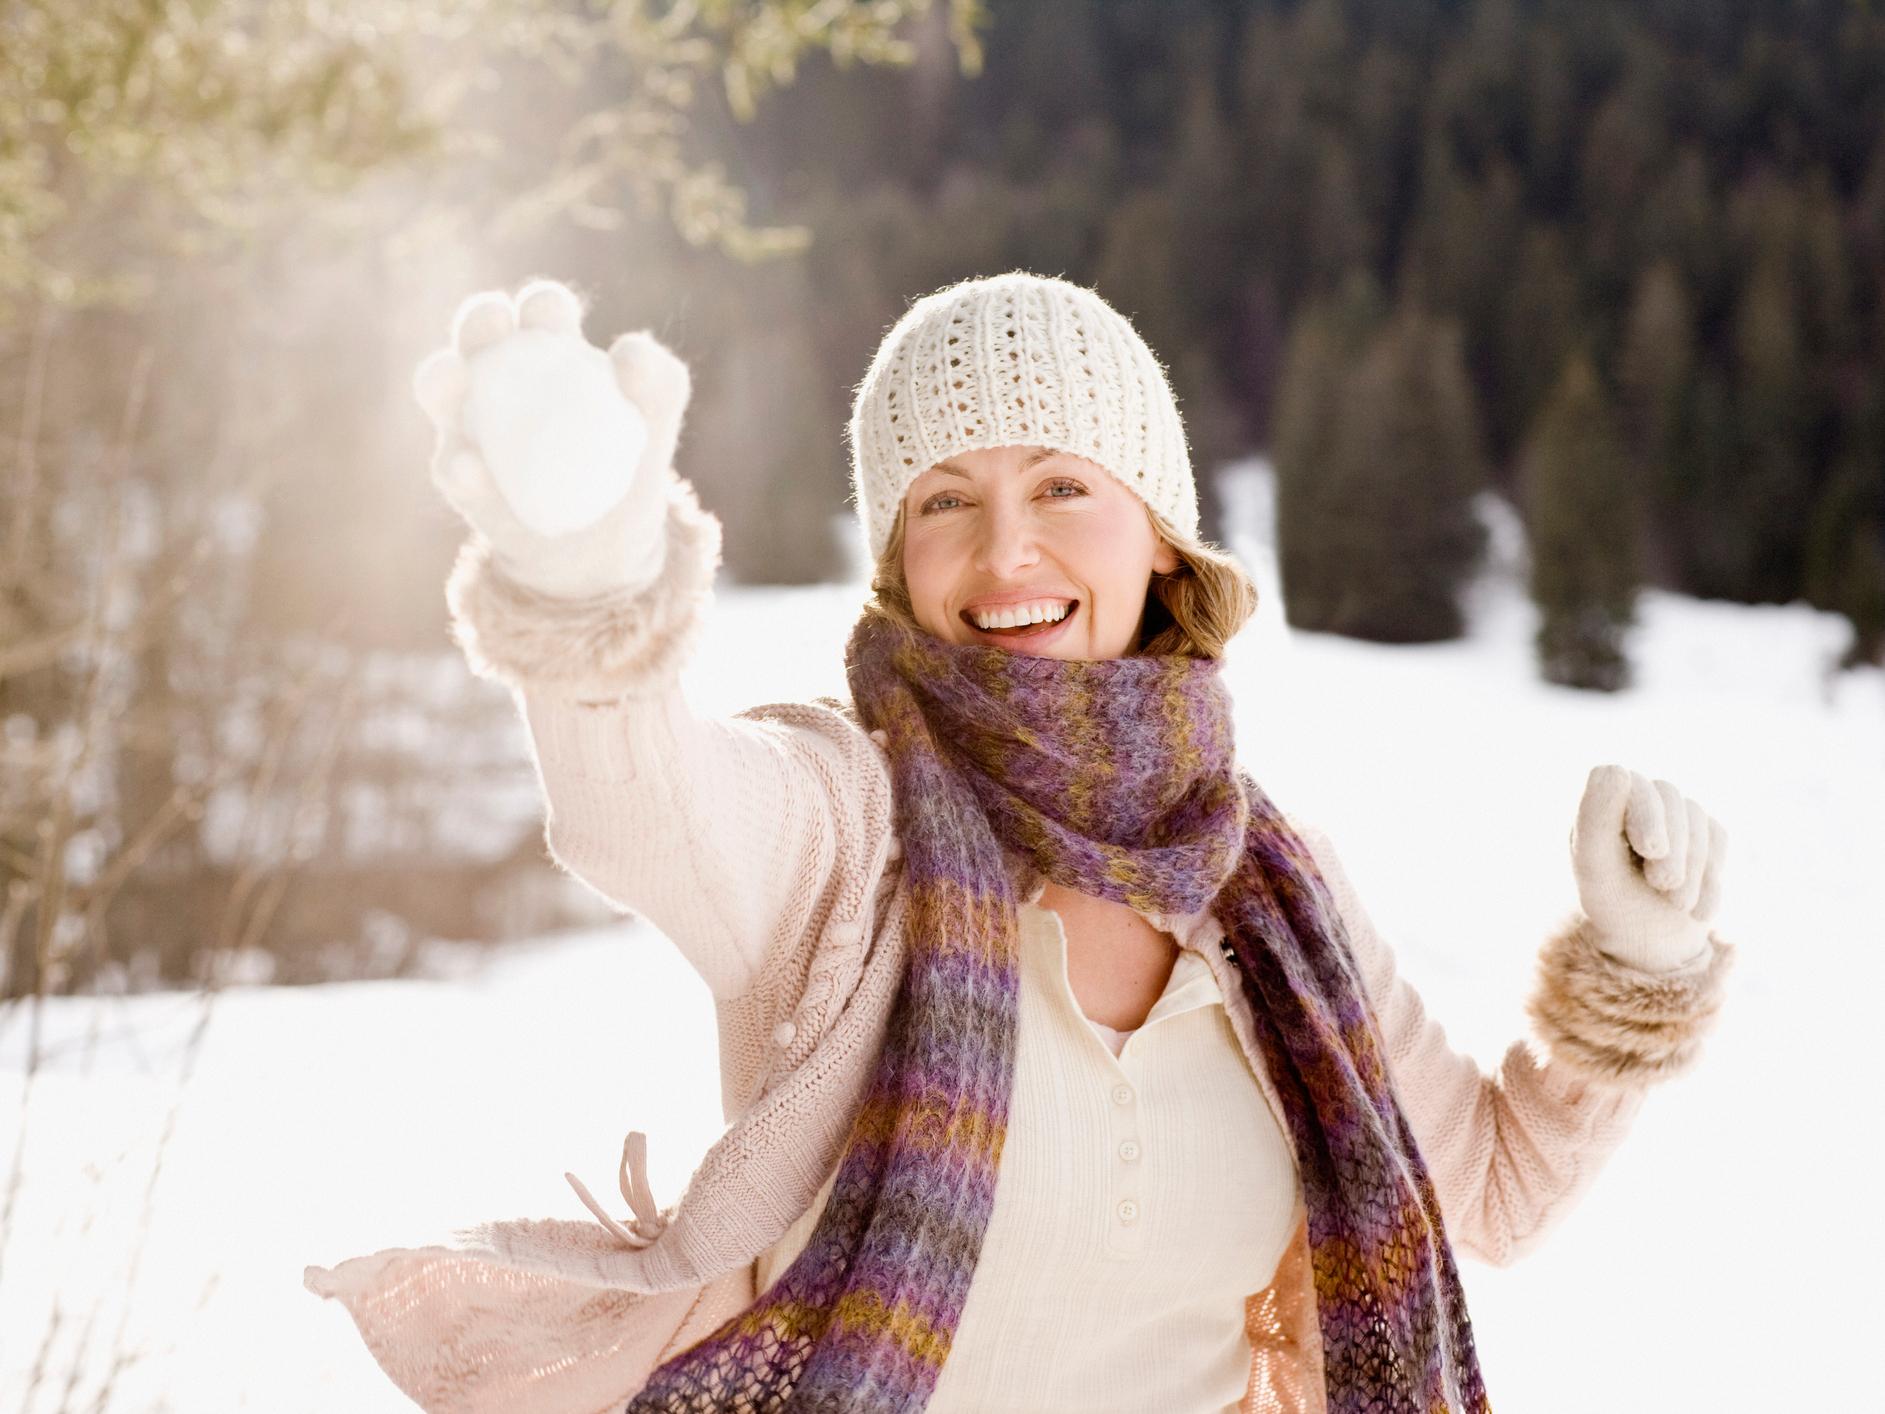 3 weird signs that indicate winter dehydration